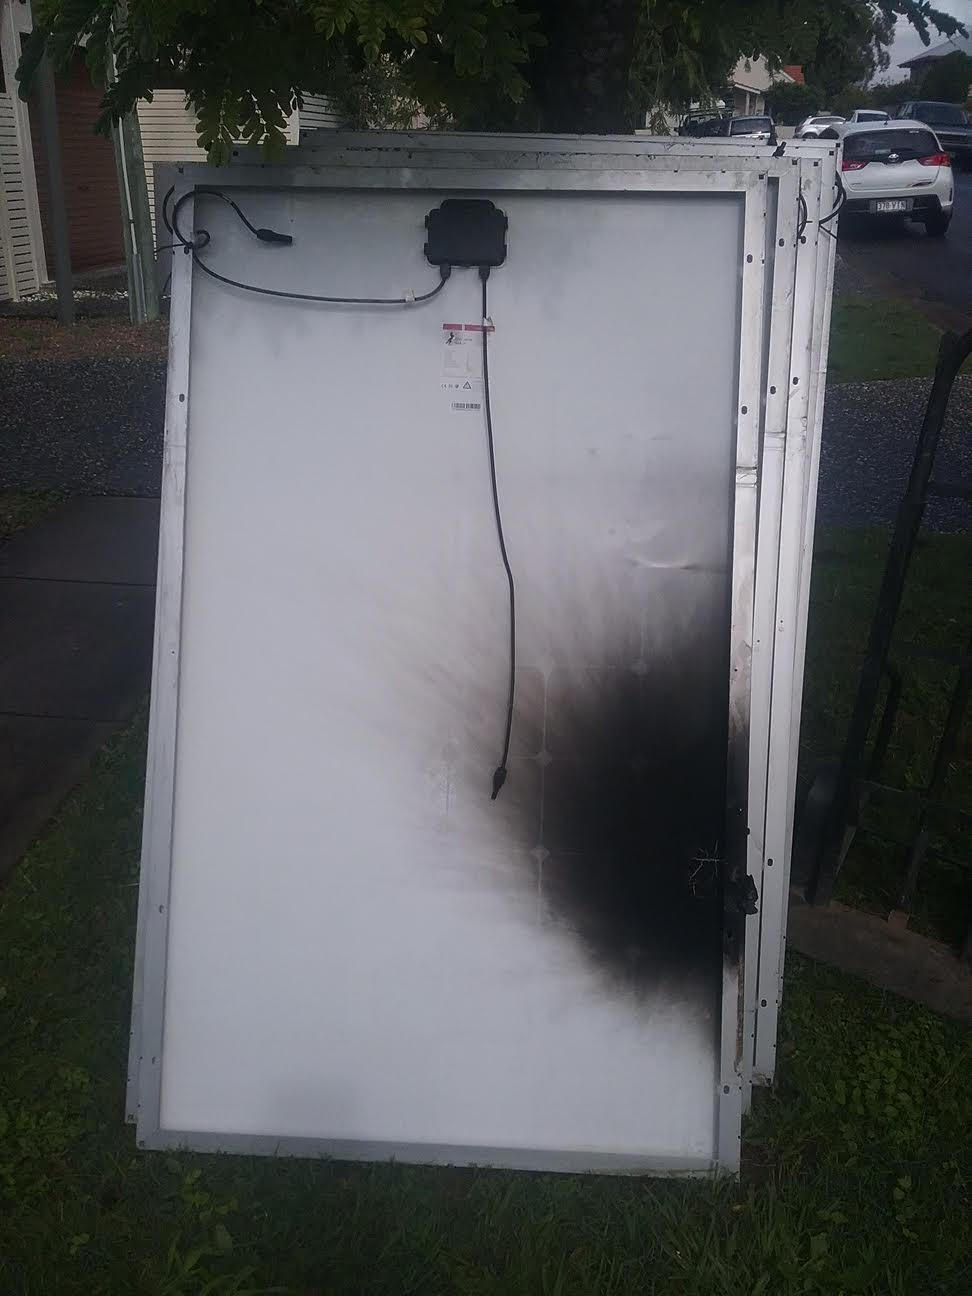 Burns to solar panel